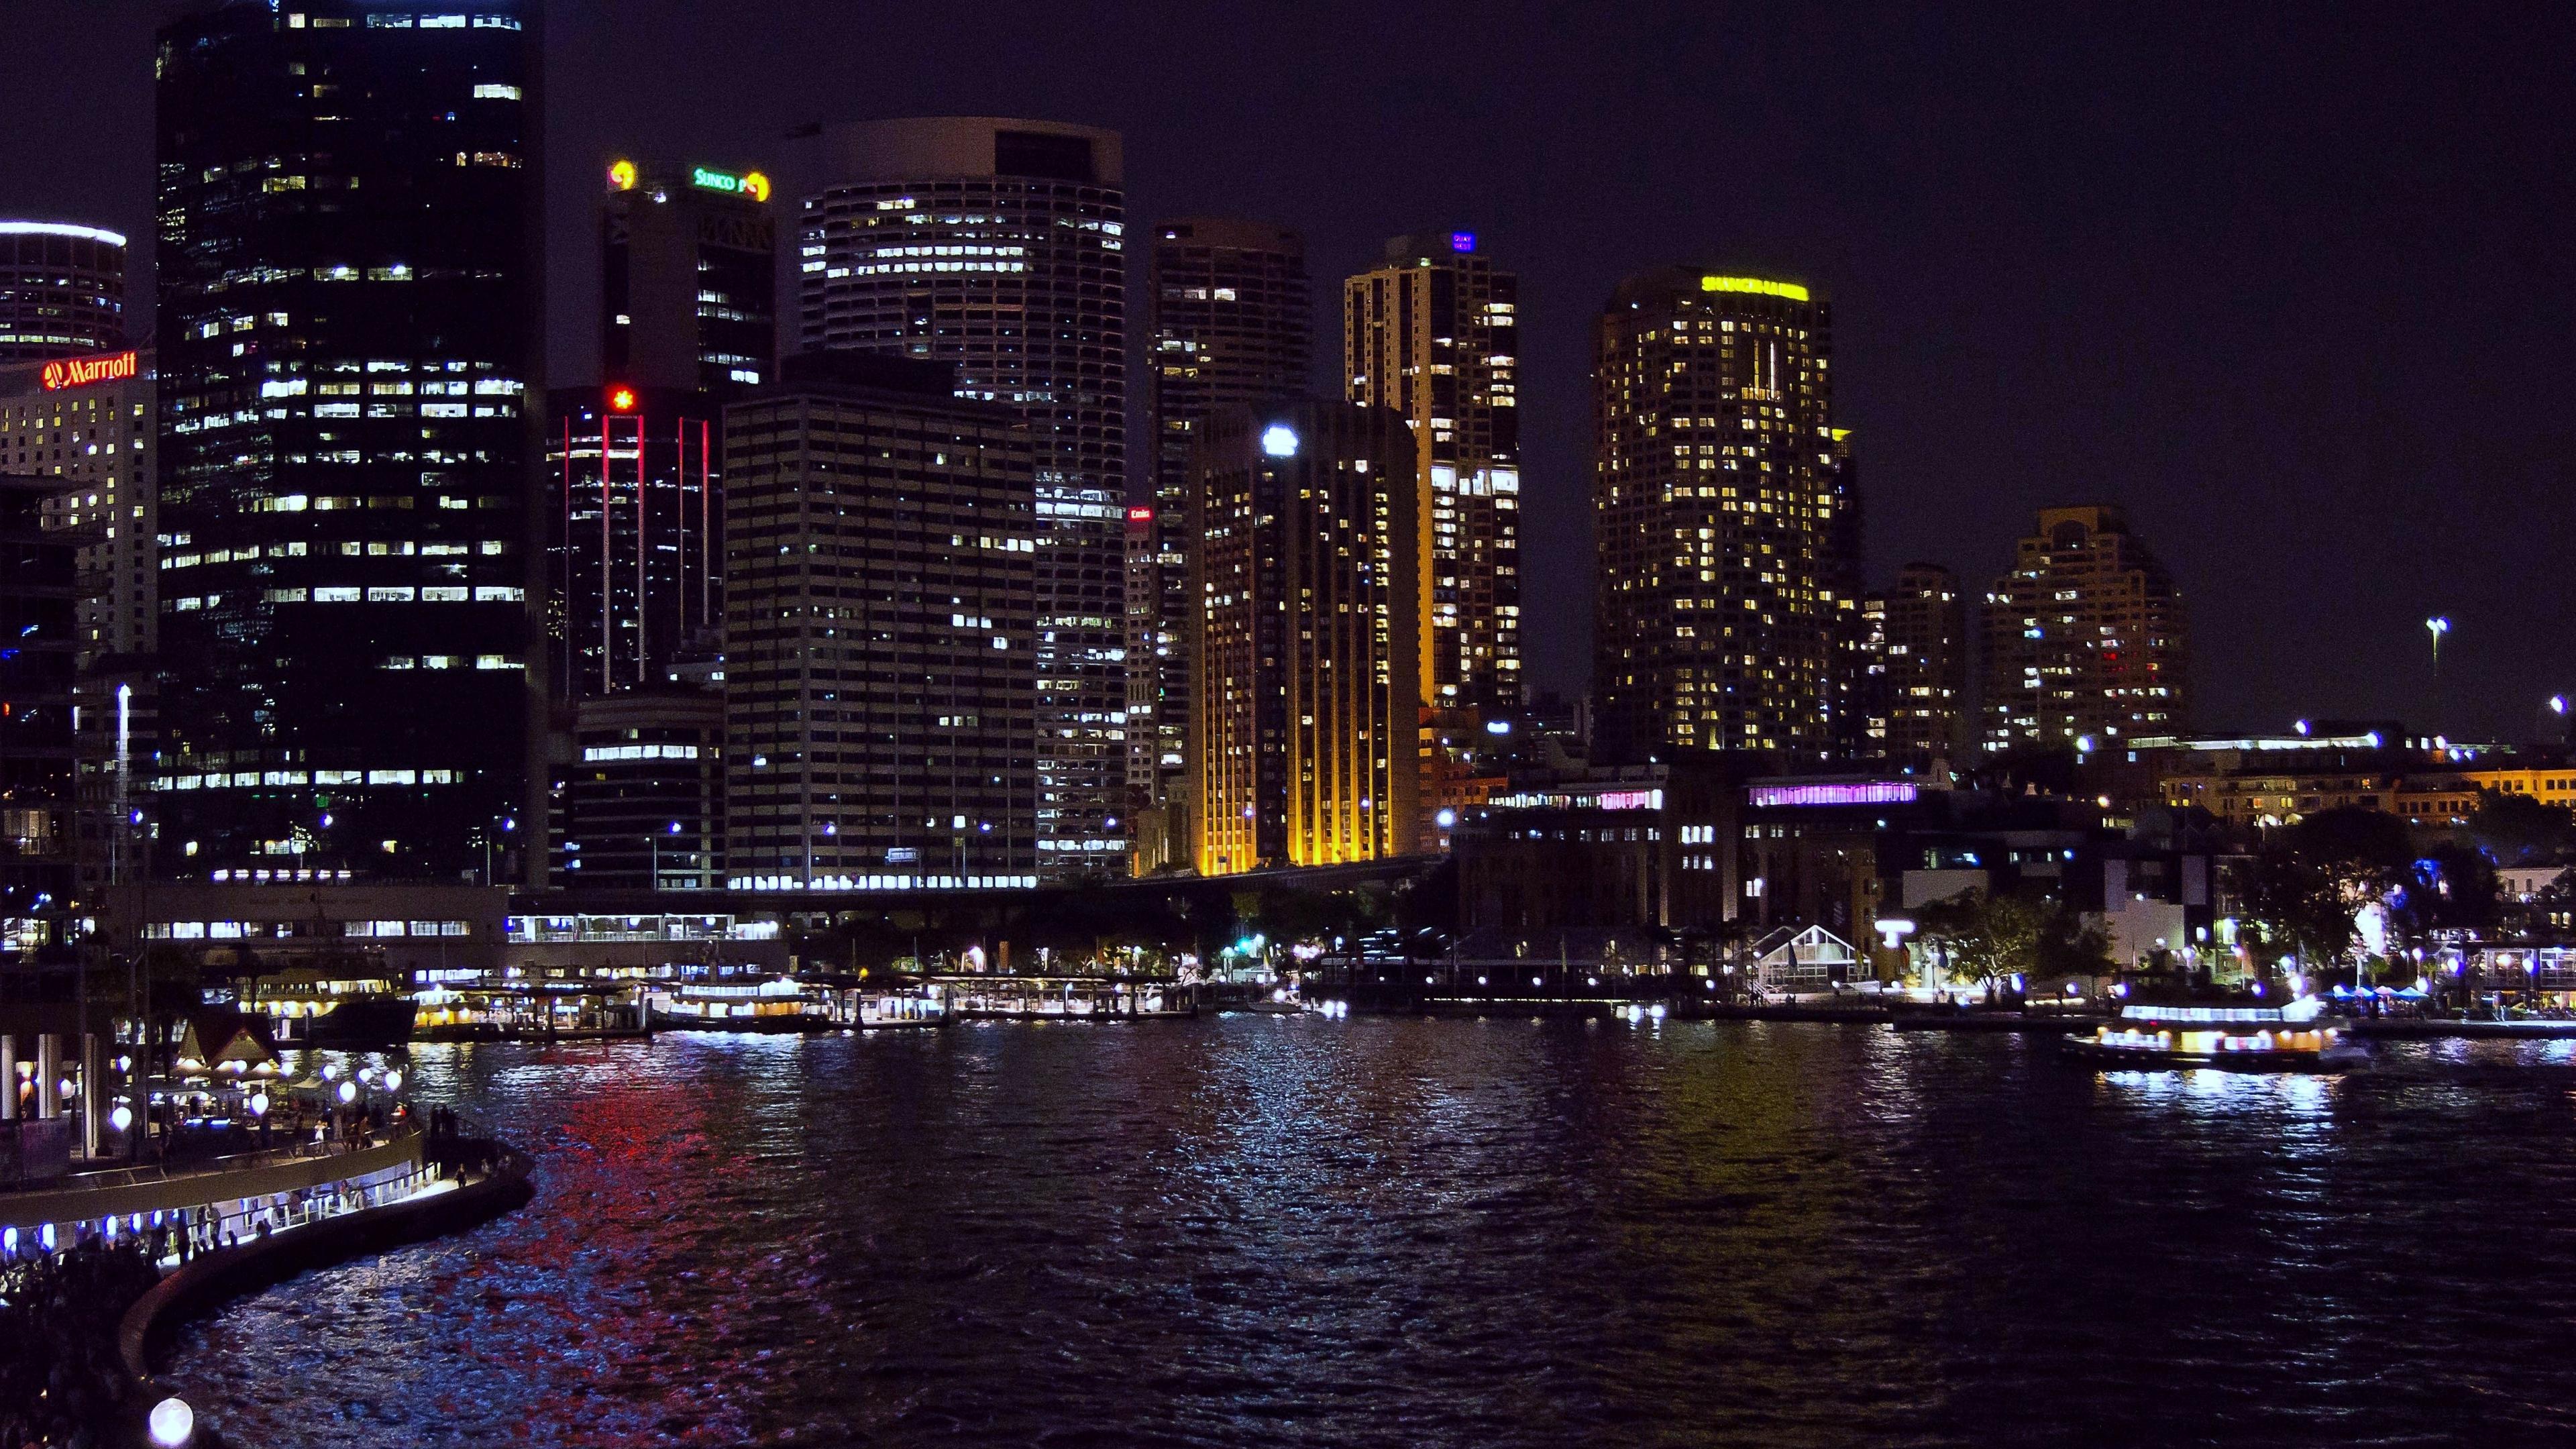 sydney australia night 4k 1538068711 - sydney, australia, night 4k - Sydney, Night, Australia